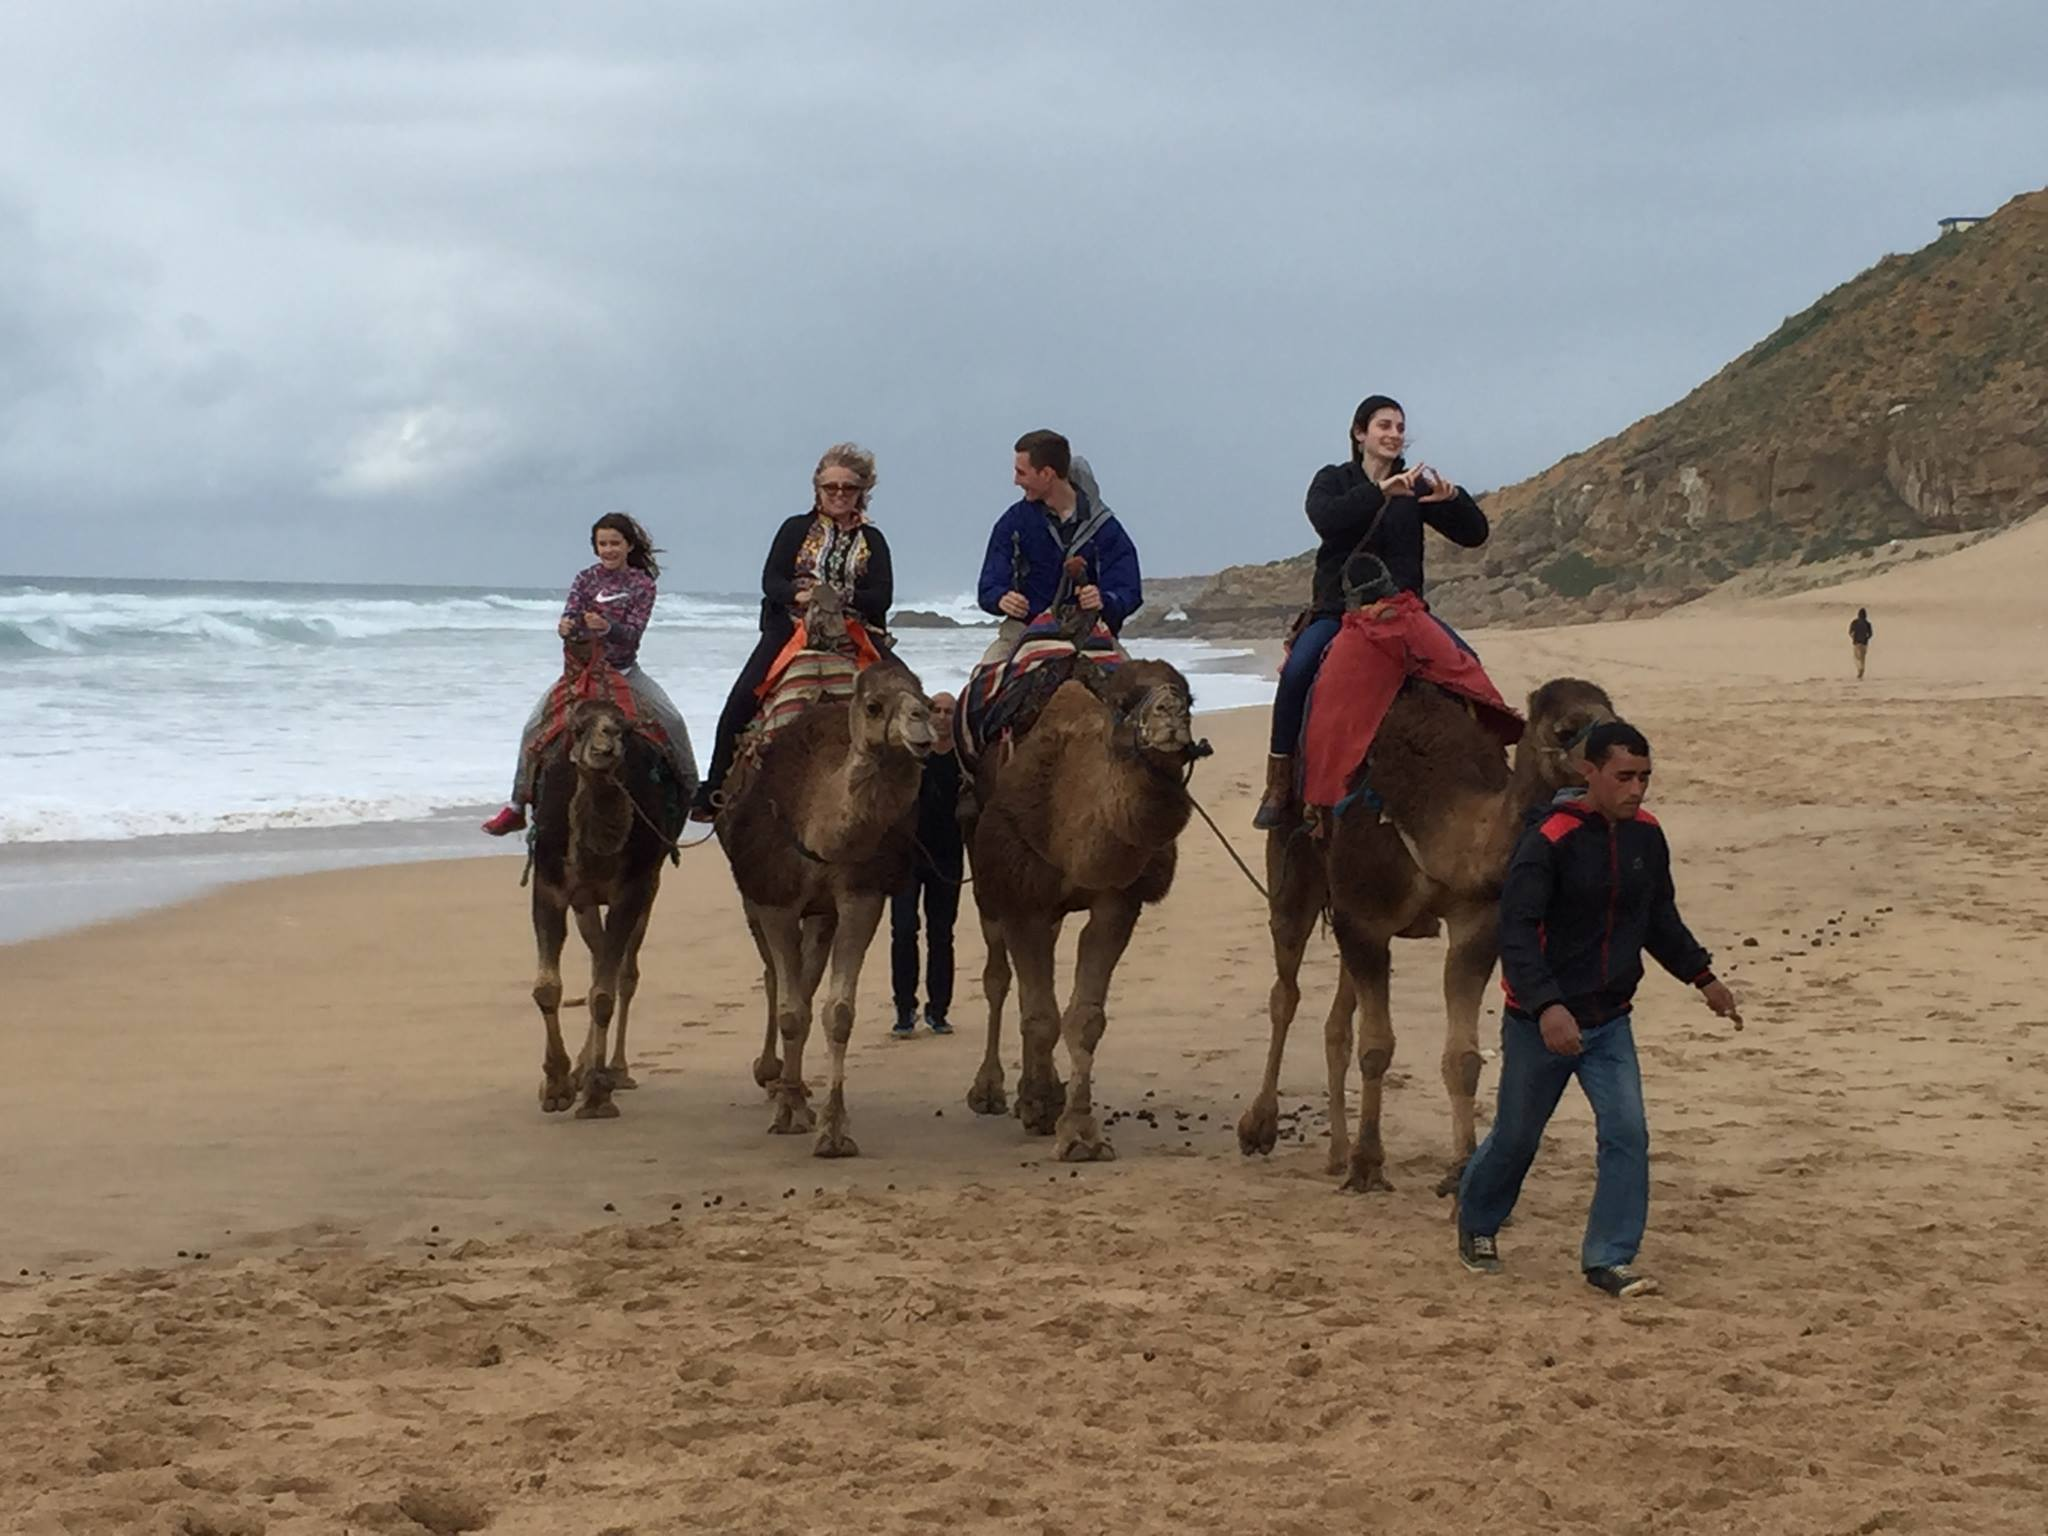 Excursion to Morocco - MundoLengua´s programs